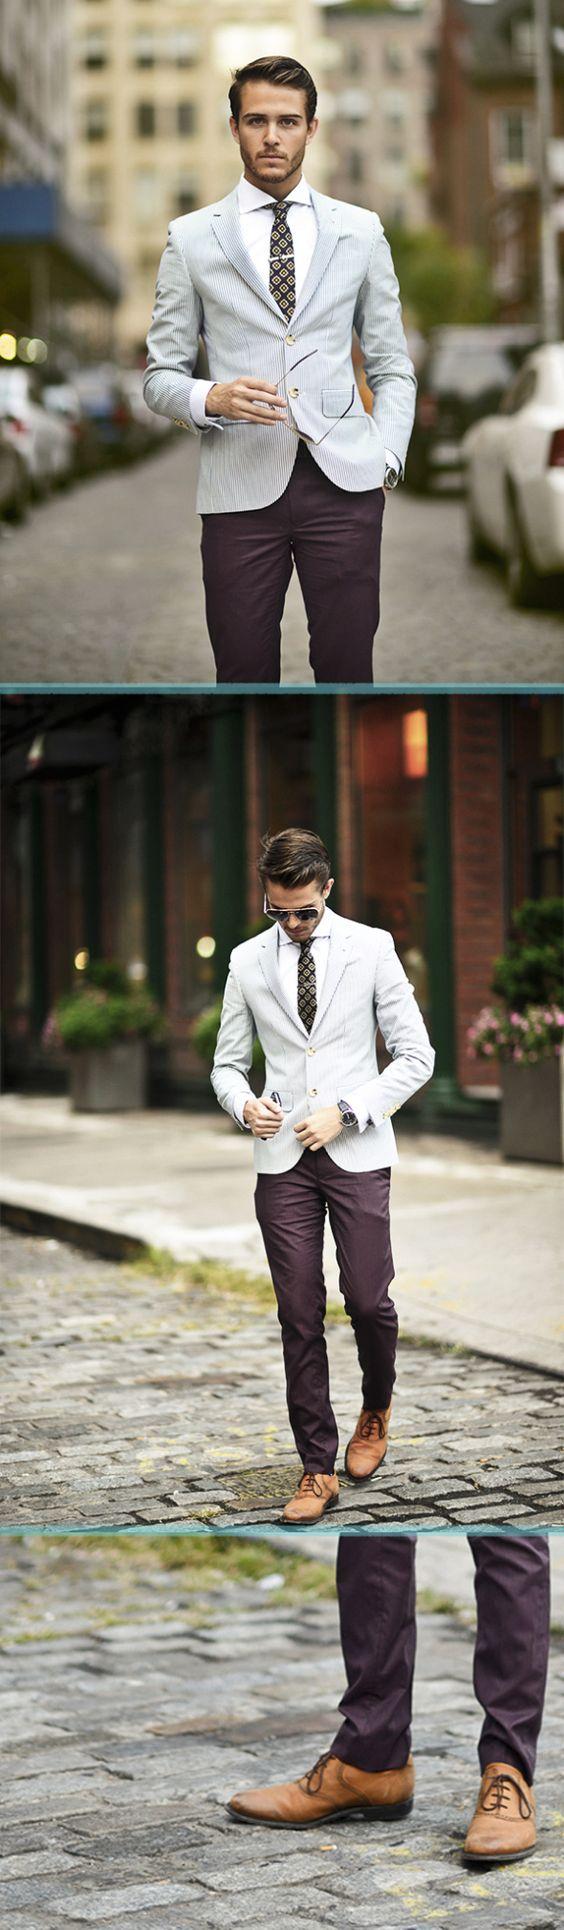 Que tu saco contraste con el resto de tu outfit! http://www.linio.com.mx/moda/ropa-para-caballero/?utm_source=pinterest&utm_medium=socialmedia&utm_campaign=MEX_pinterest___fashion_tuxblanco_20141216_18&wt_sm=mx.socialmedia.pinterest.MEX_timeline_____fashion_20141216tuxblanco18.-.fashion